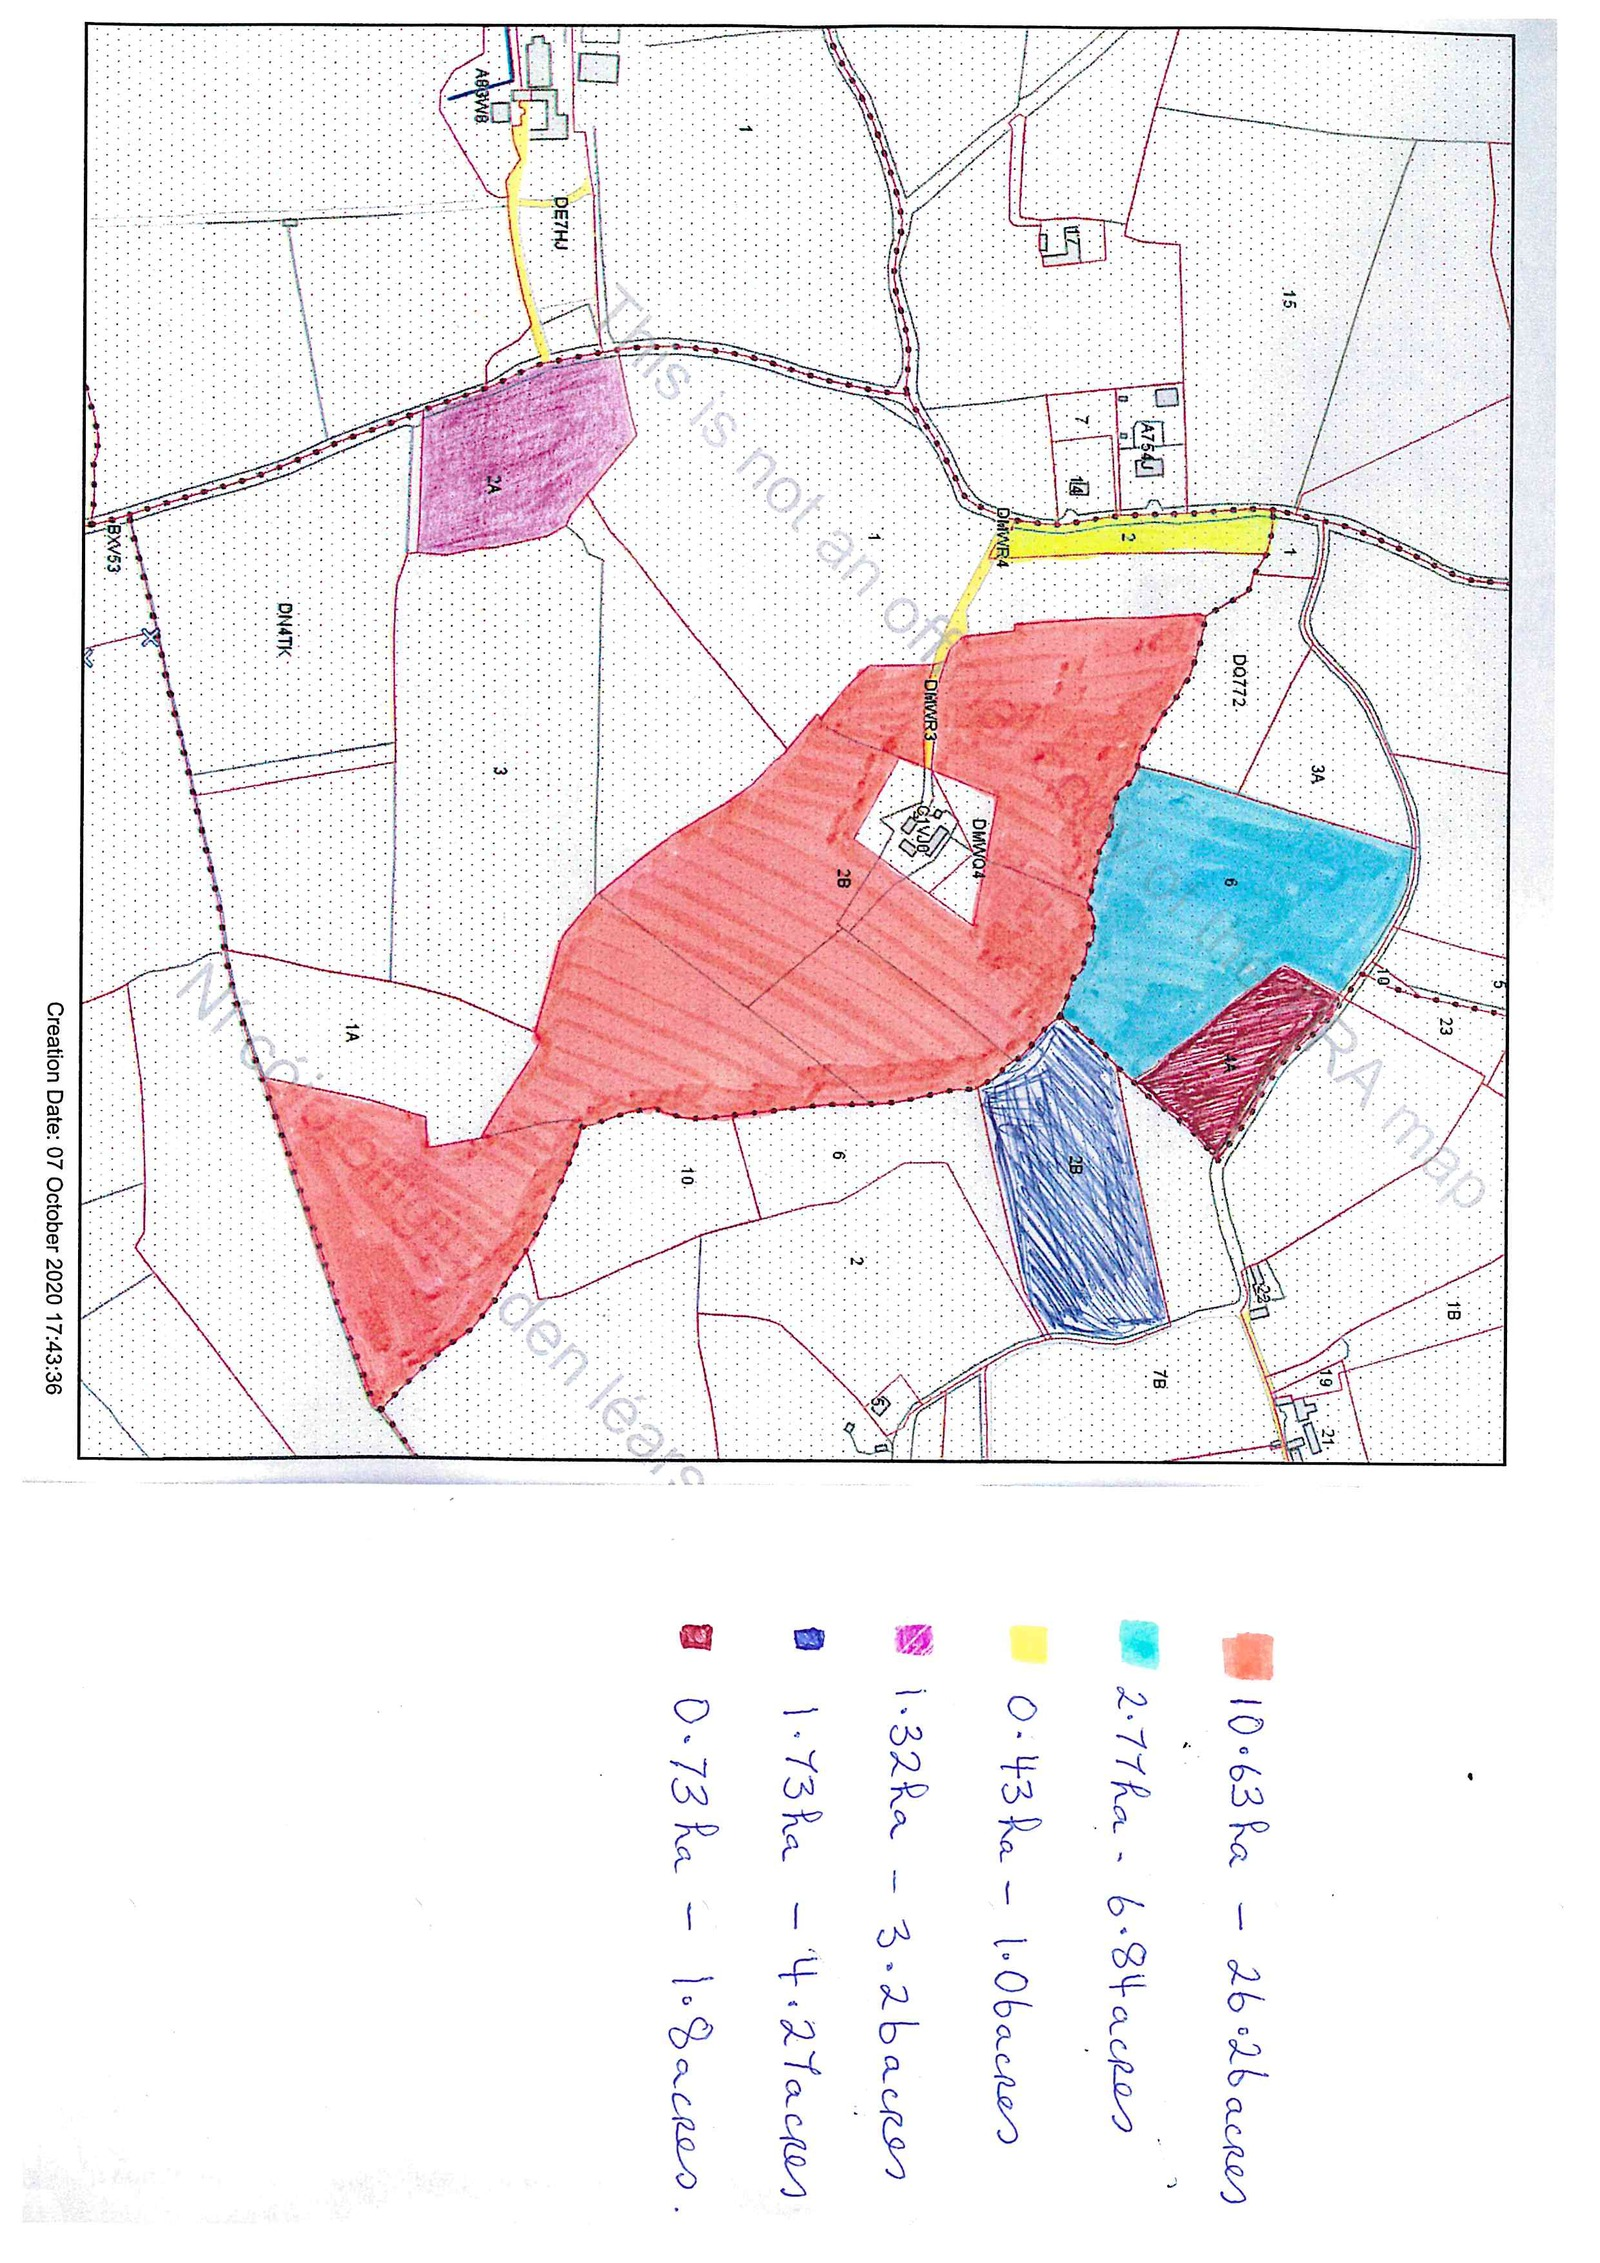 Gortnahaha, Loughmore, Templemore, Co. Tipperary